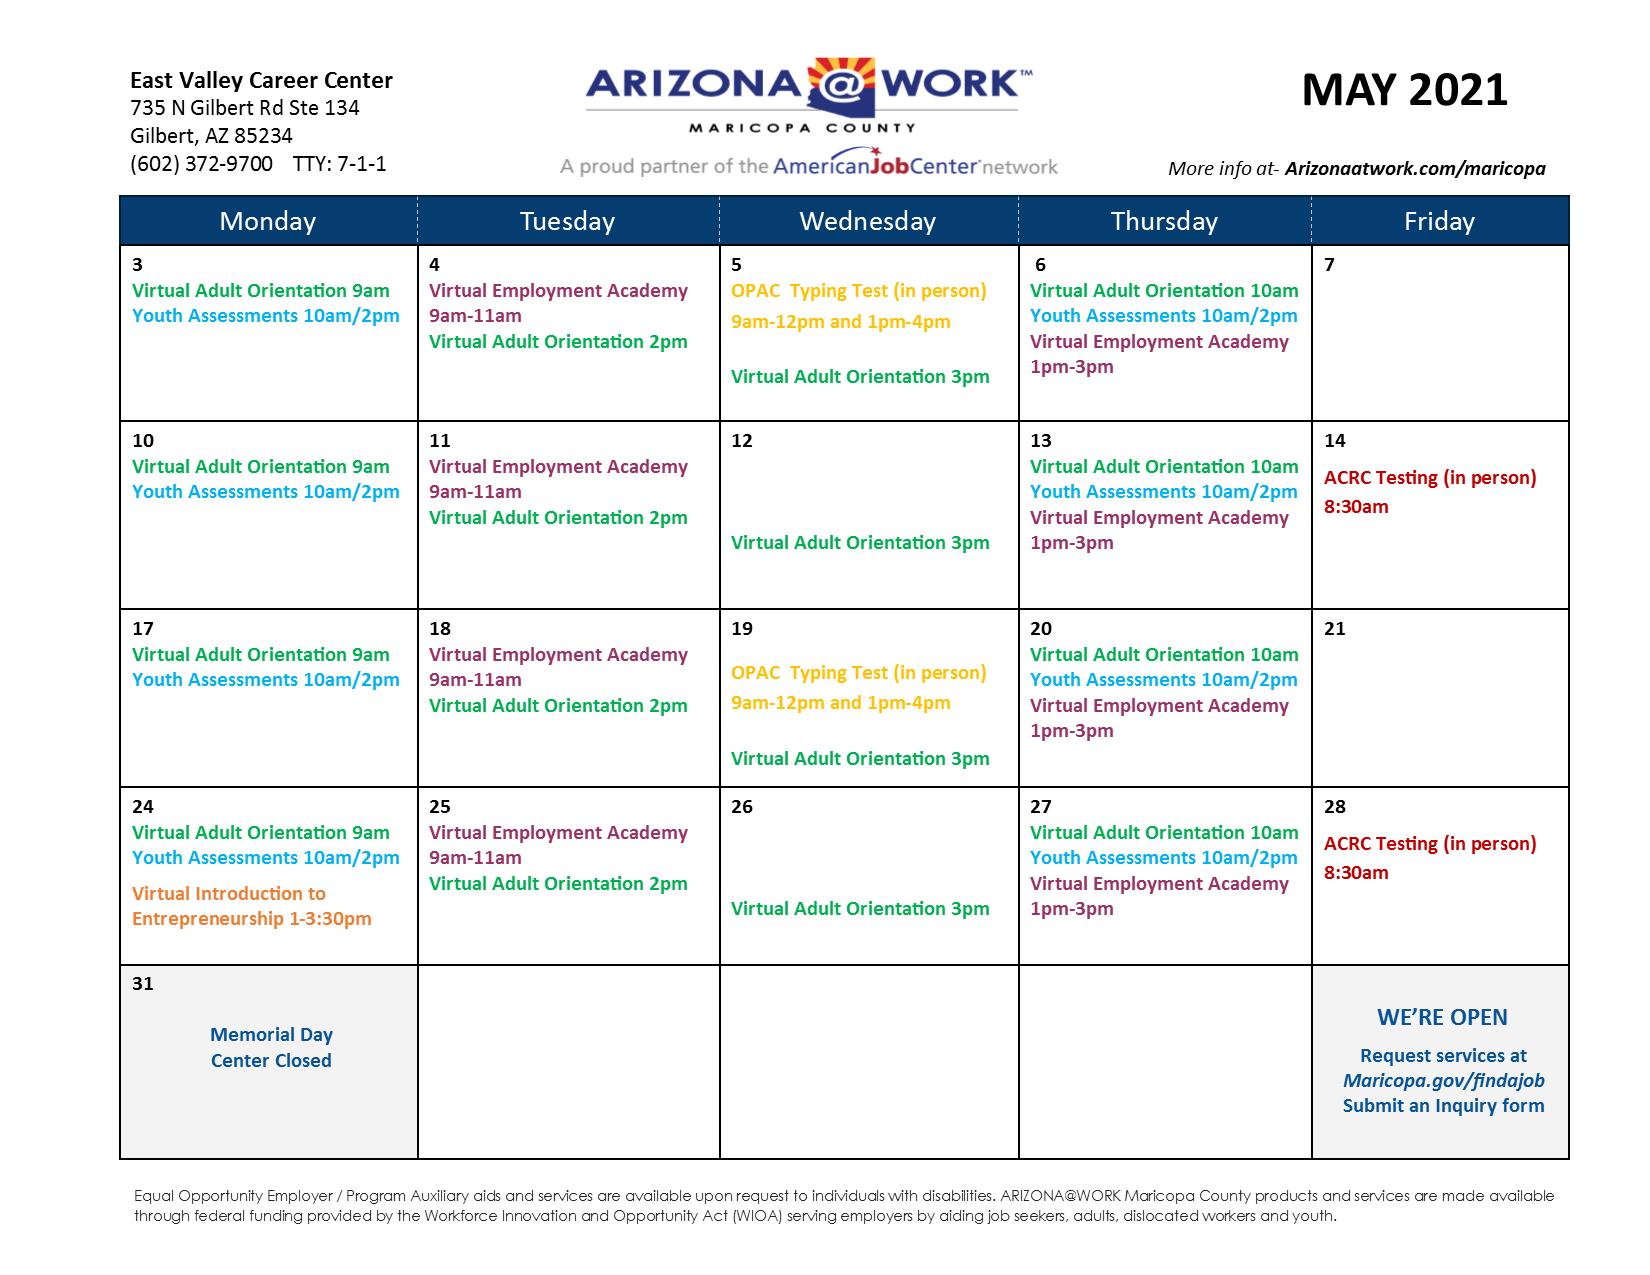 Maricopa County East Valley Center Calendar May 2021